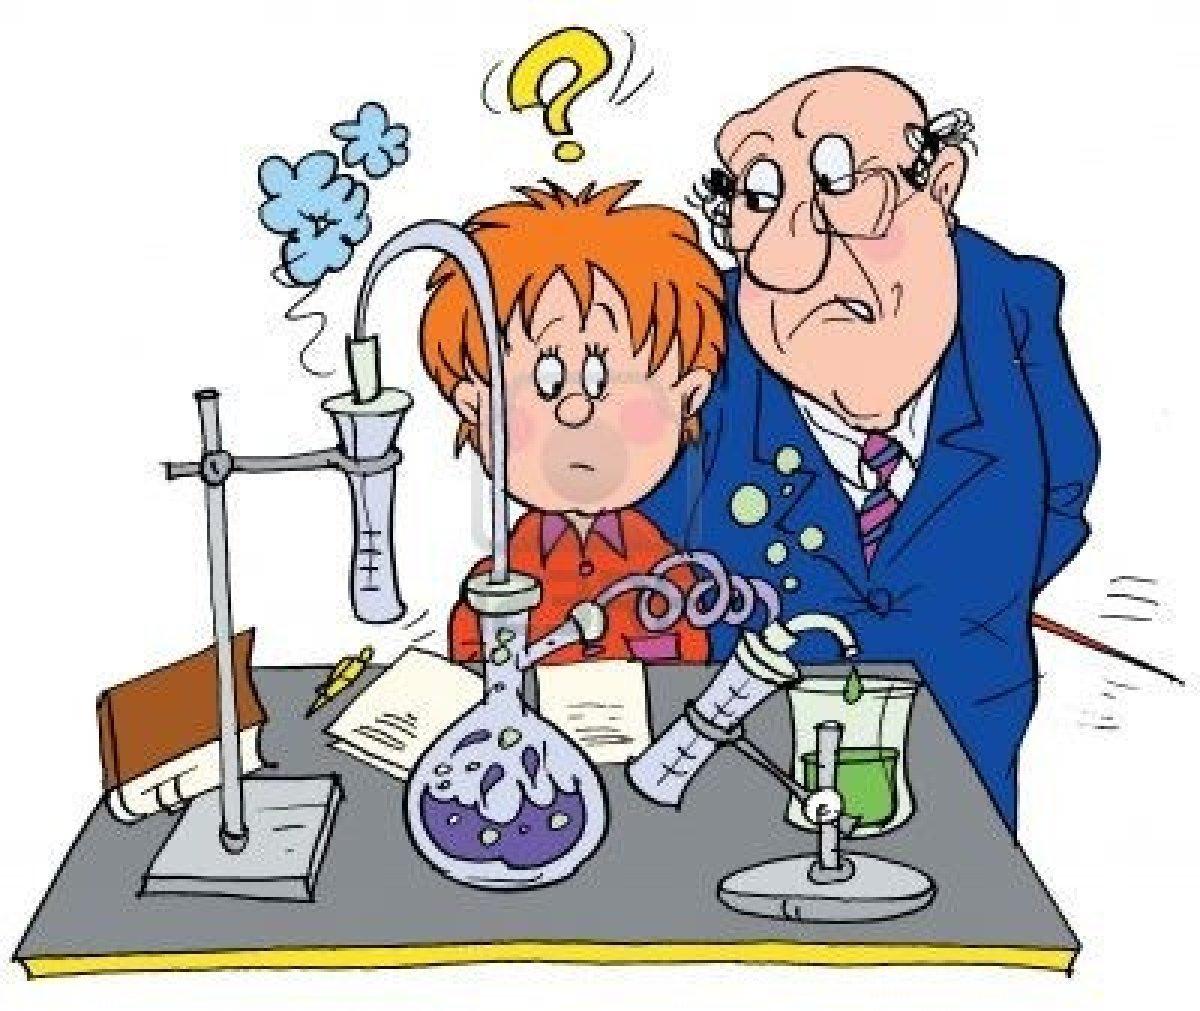 Experiment - Preparation of Sodium Chloride